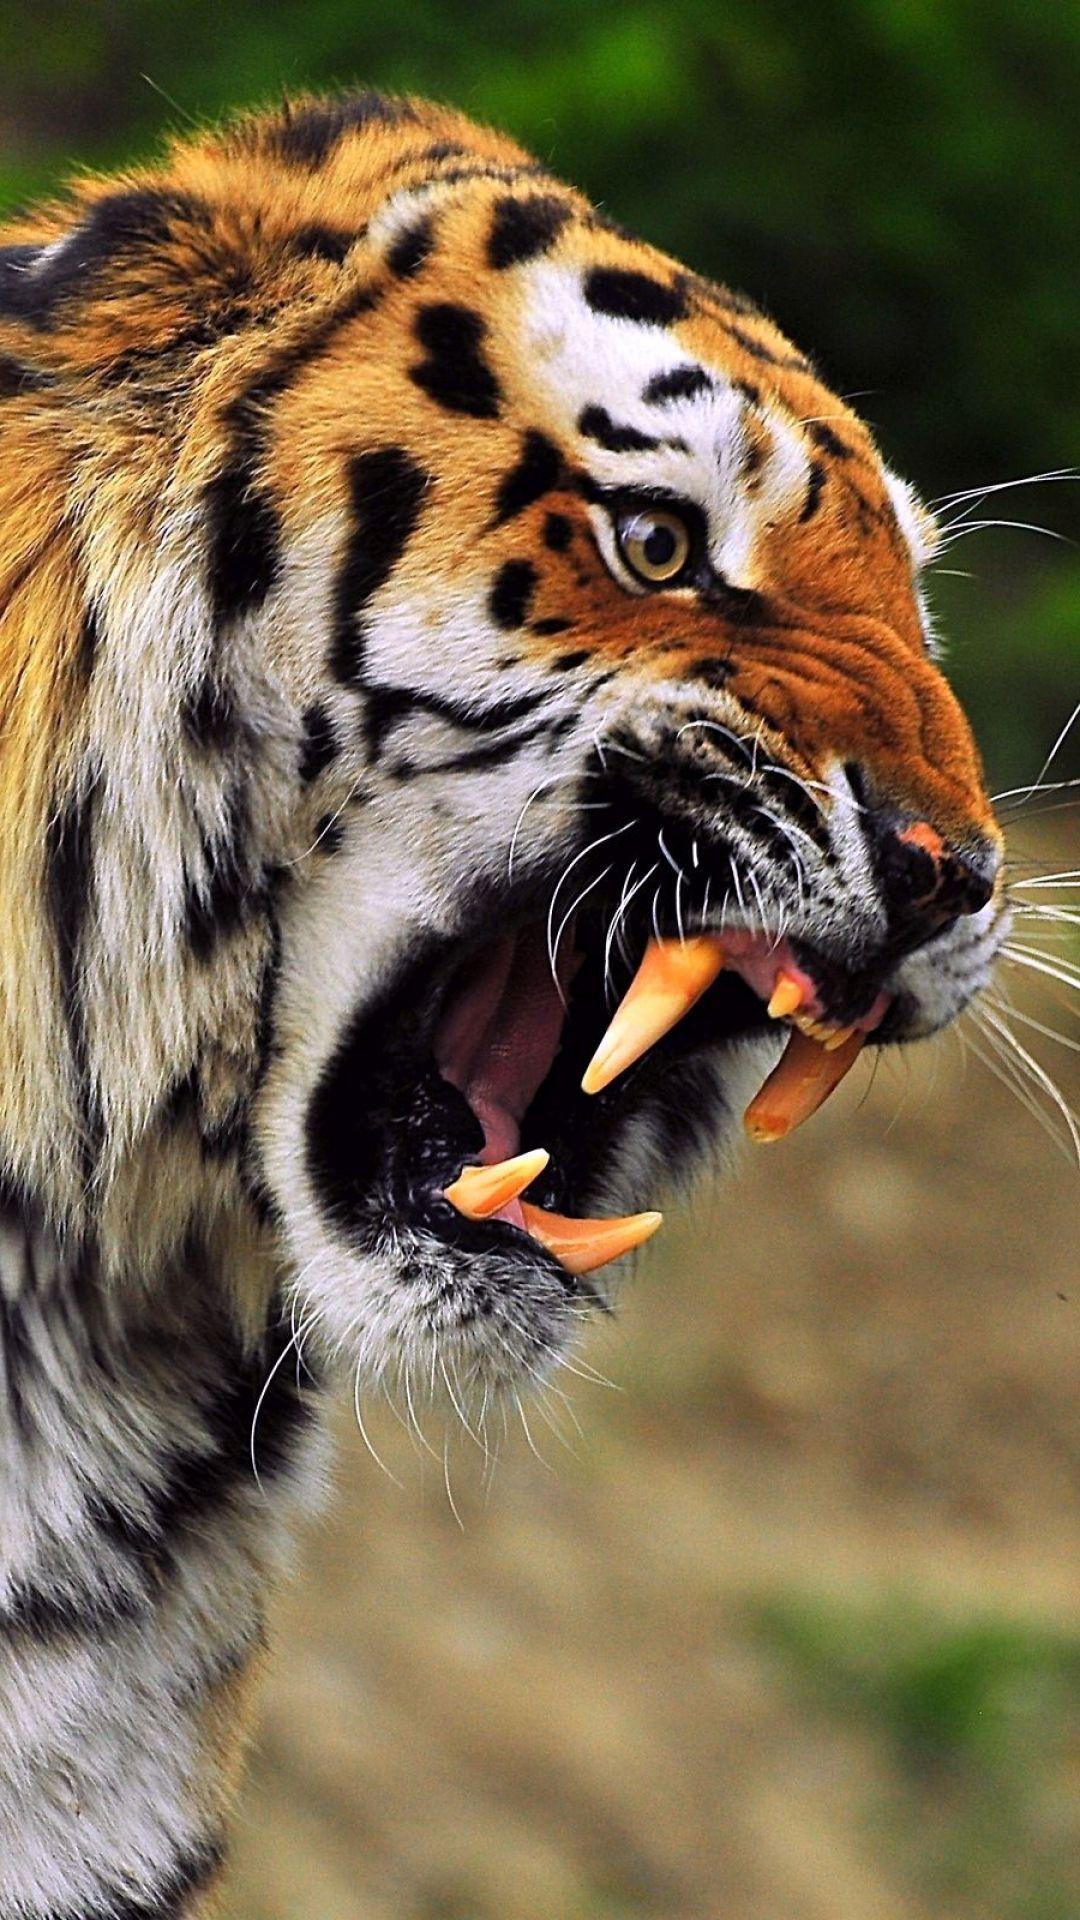 Tiger Face Wallpapers Wallpaper